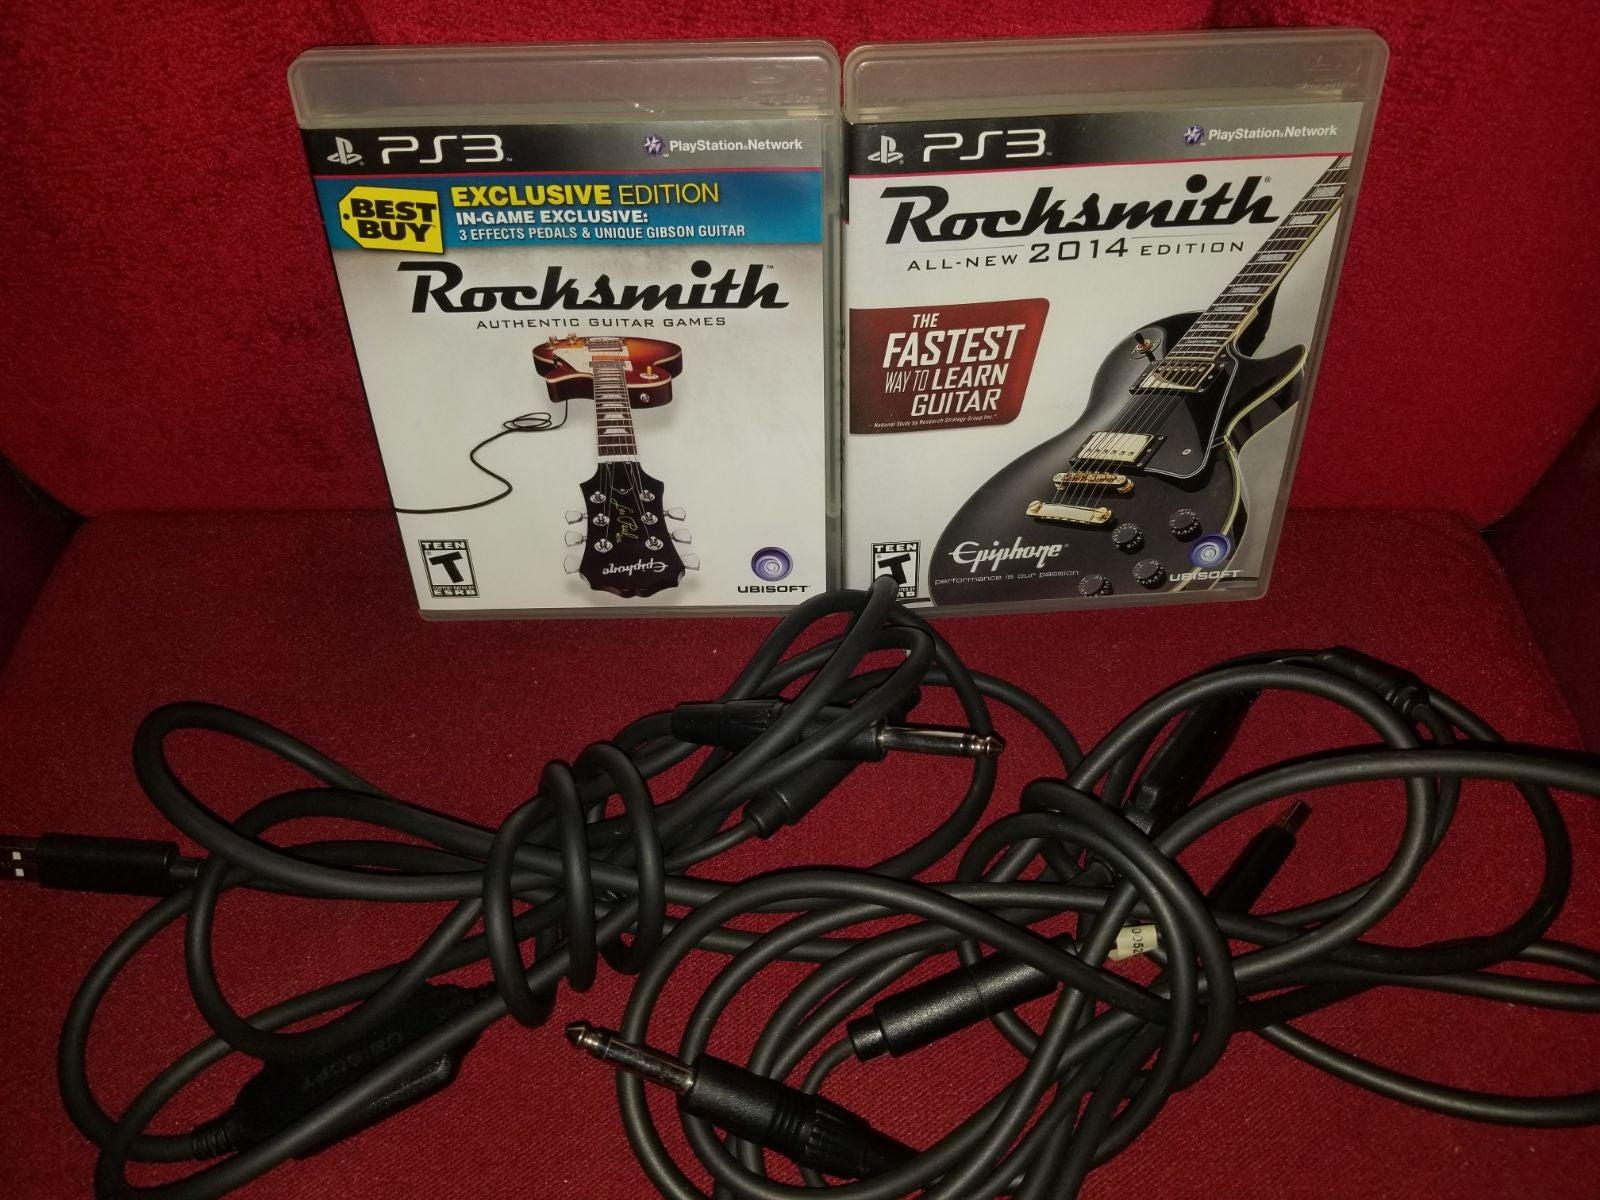 Rocksmith PS3 Games & Cables Bundle